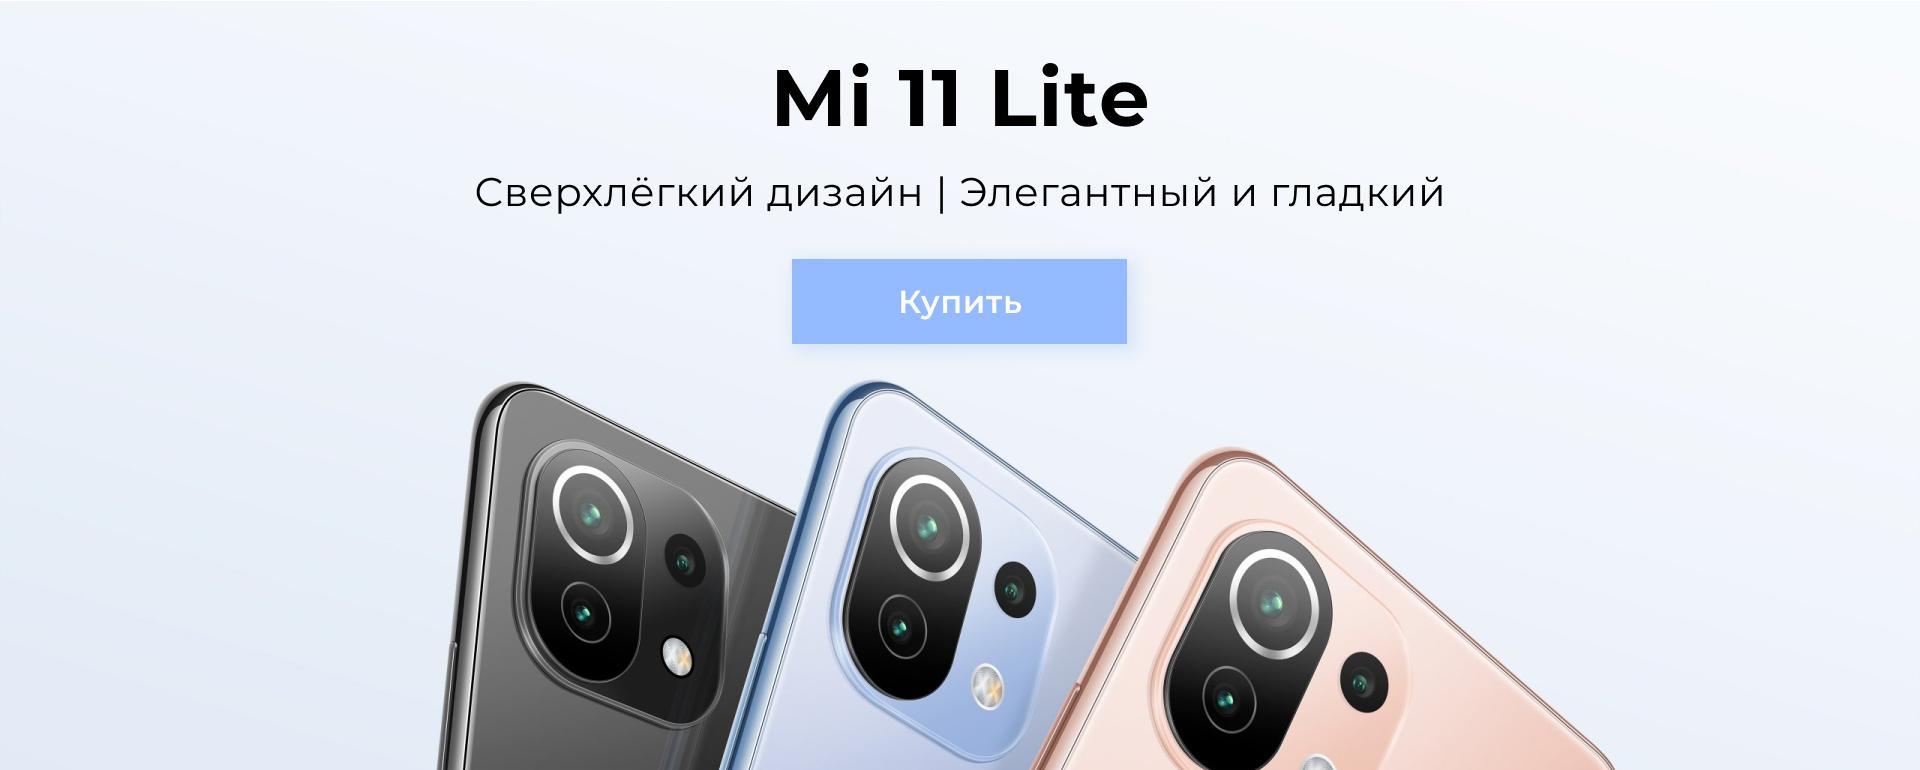 Xiaomi Mi 11 Lite купить